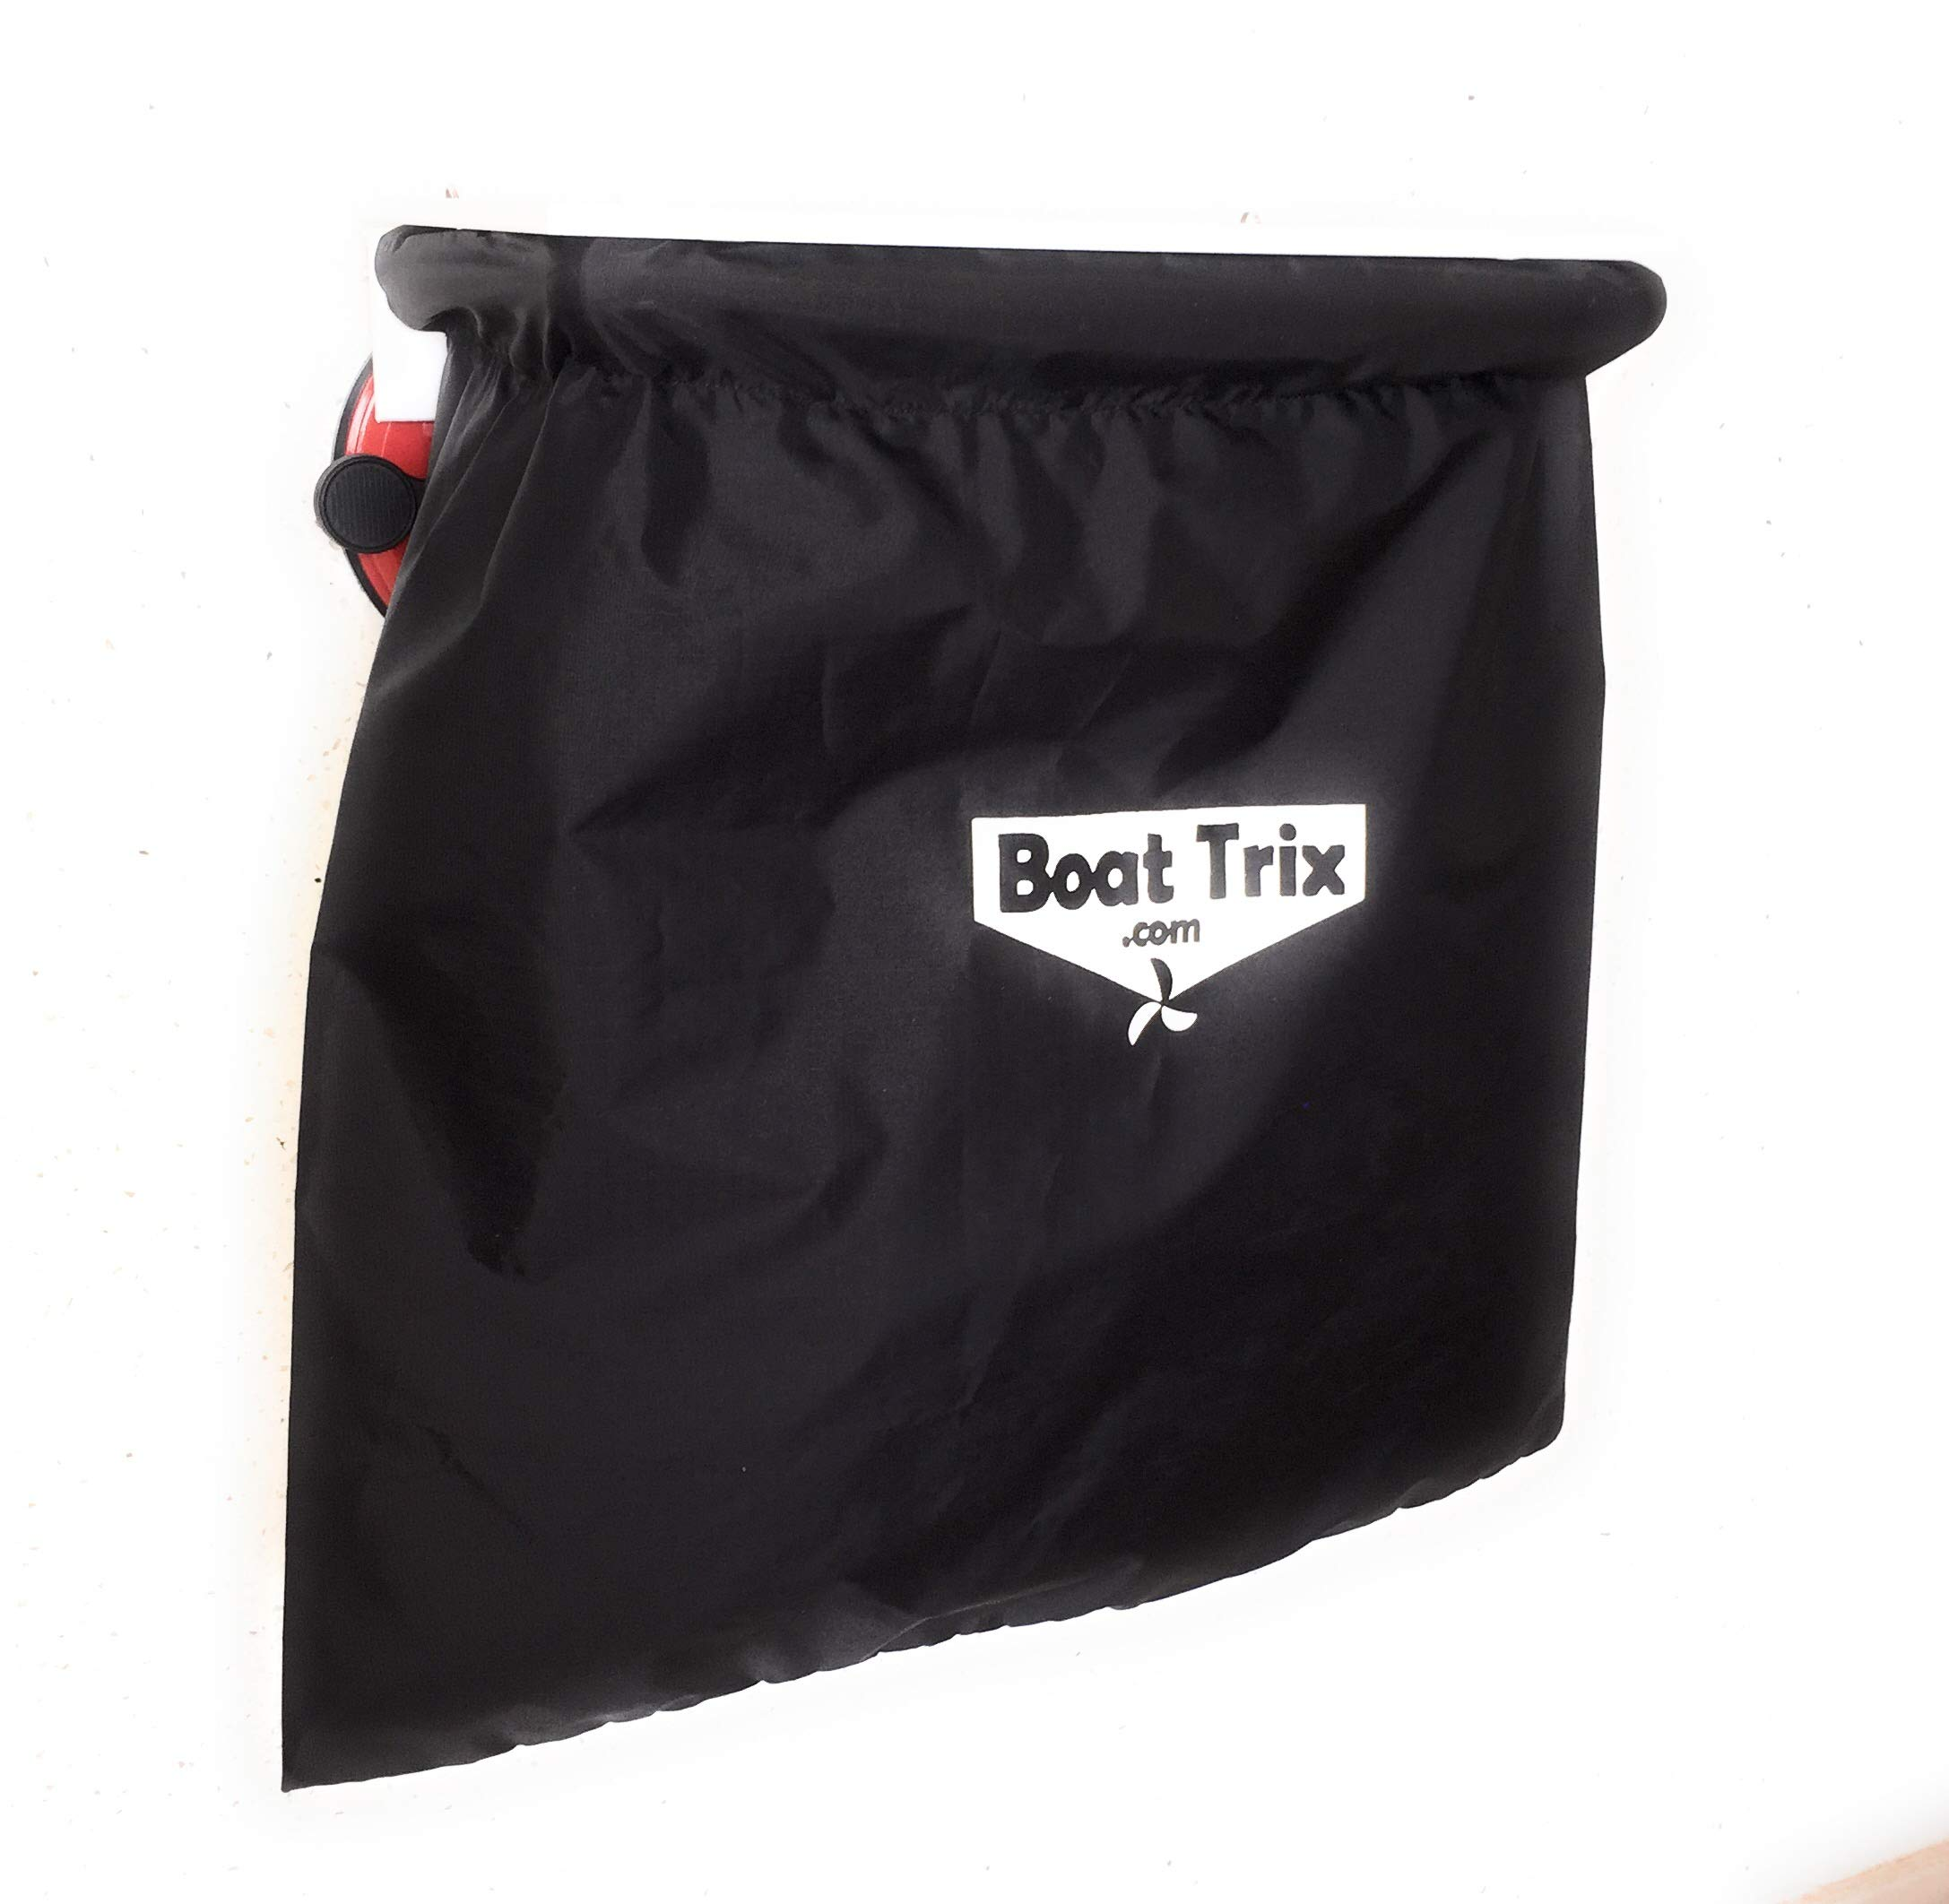 Boat Trix Marine Trash Bag with Mega Suction Cup Mount